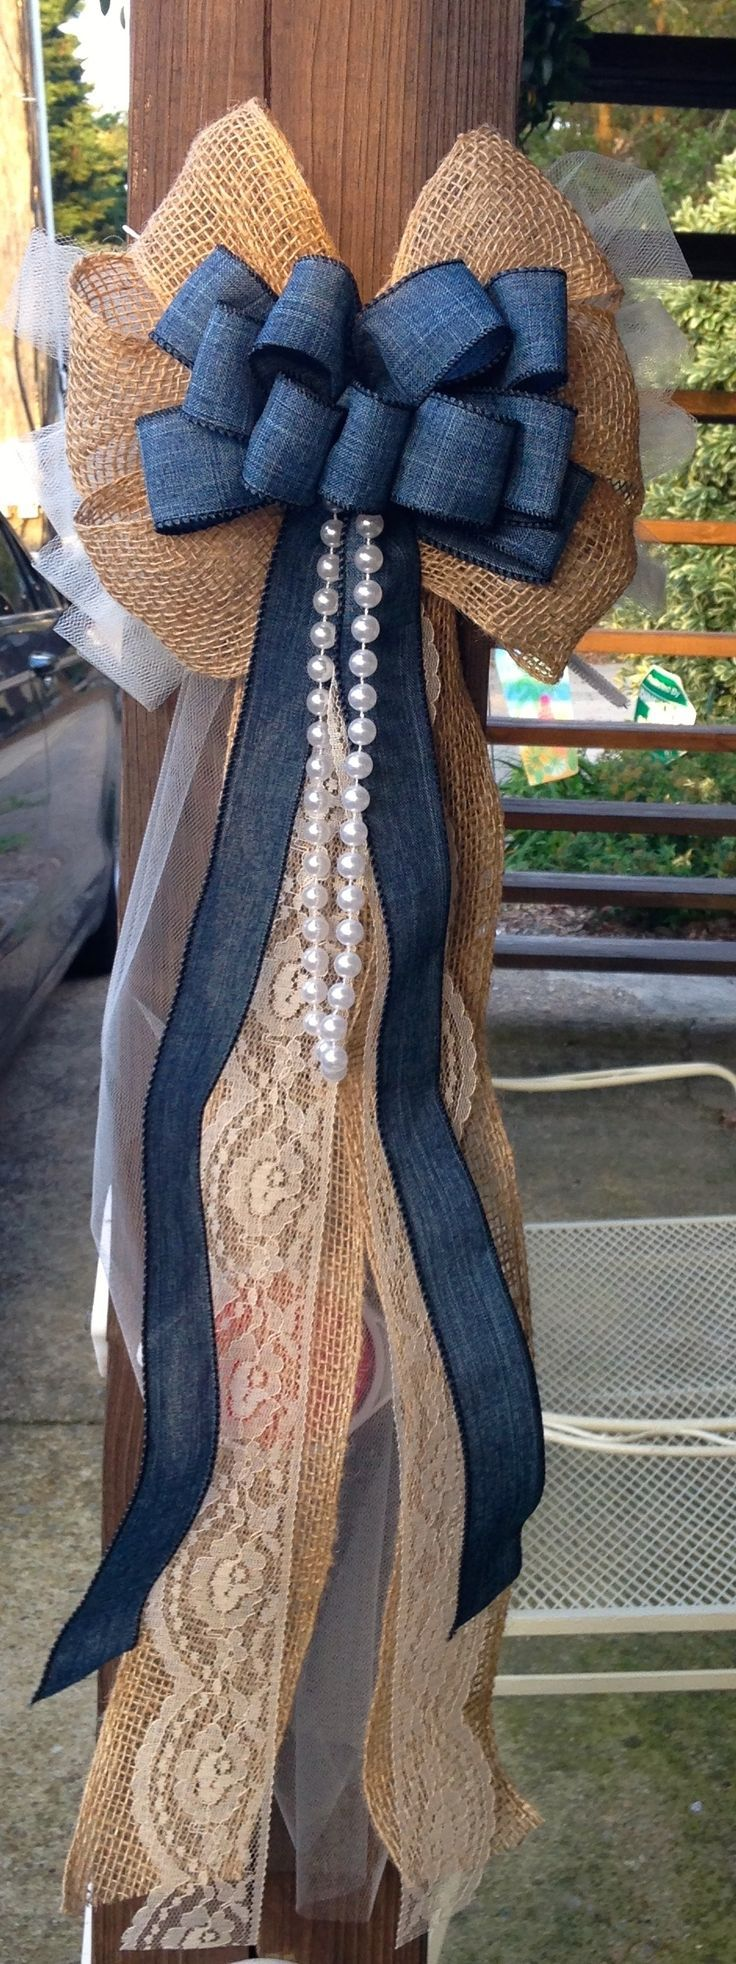 Denim Burlap Lace & Pearl Rustic Wedding Bow